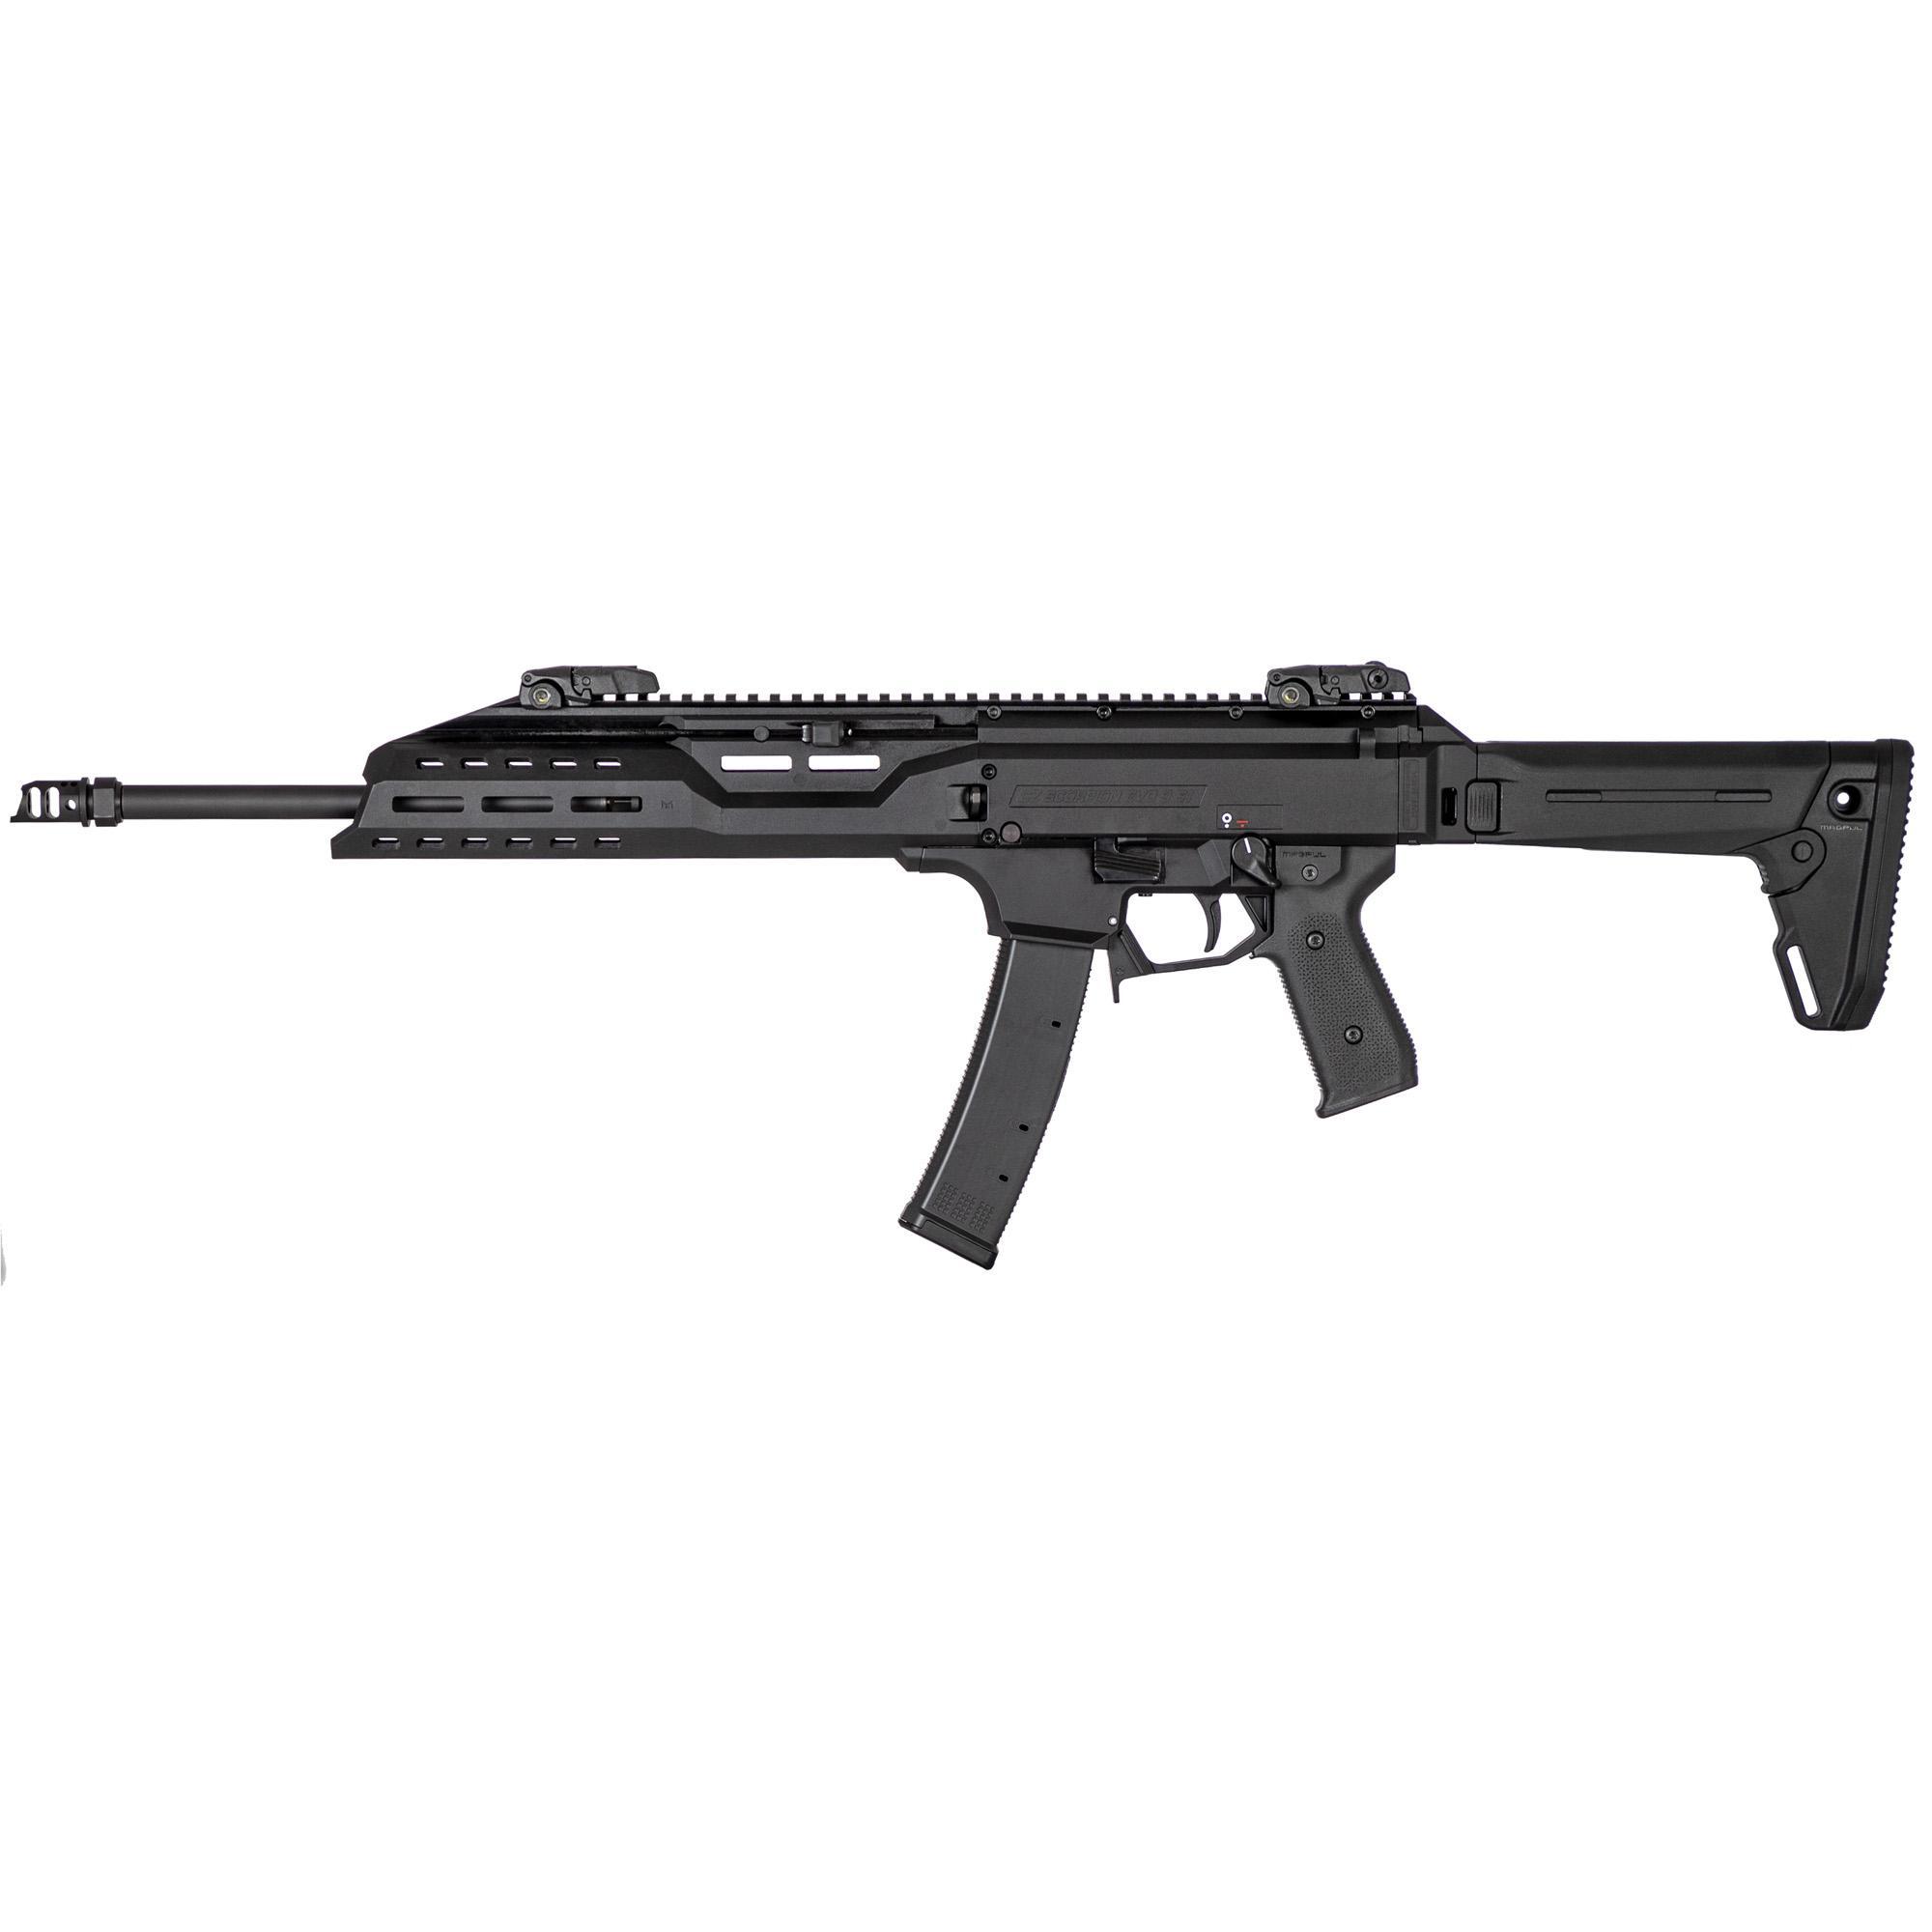 CZ Cz Scorpion Crb 9mm 16.2 35rd Black Mp